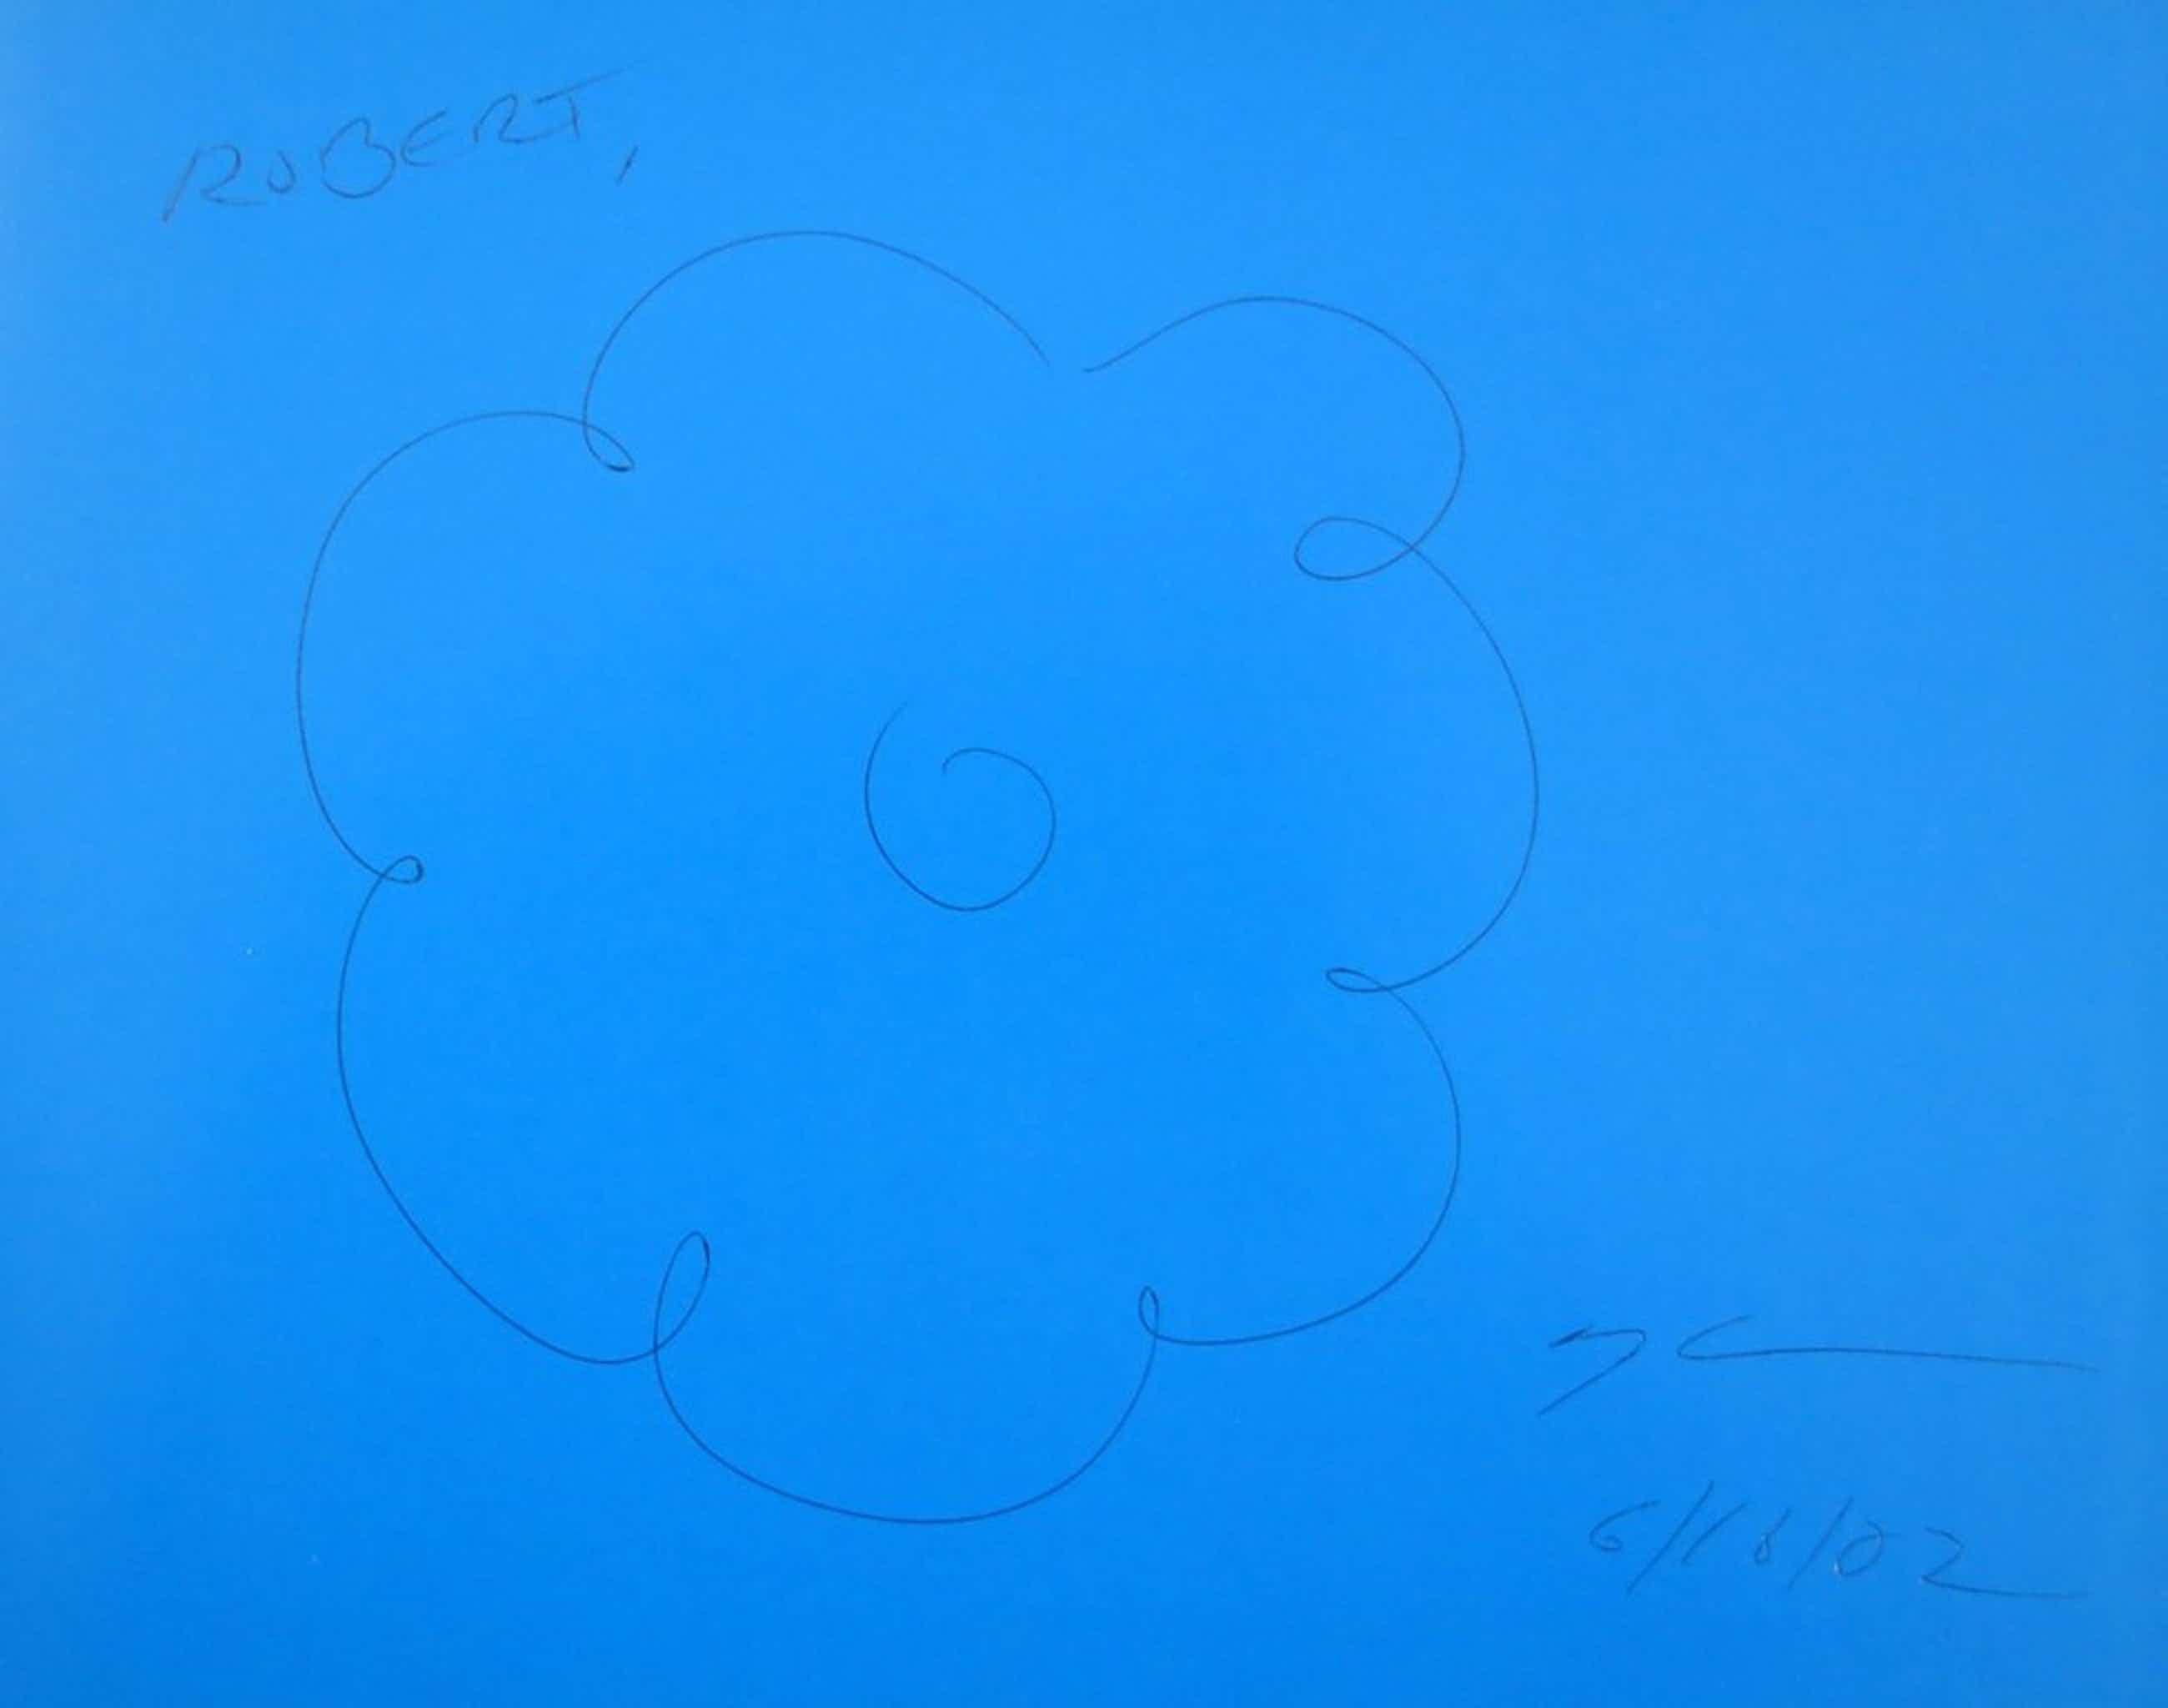 Jeff Koons: Originele pentekening op voorblad van catalogus Easyfun-Ethereal  kopen? Bied vanaf 250!